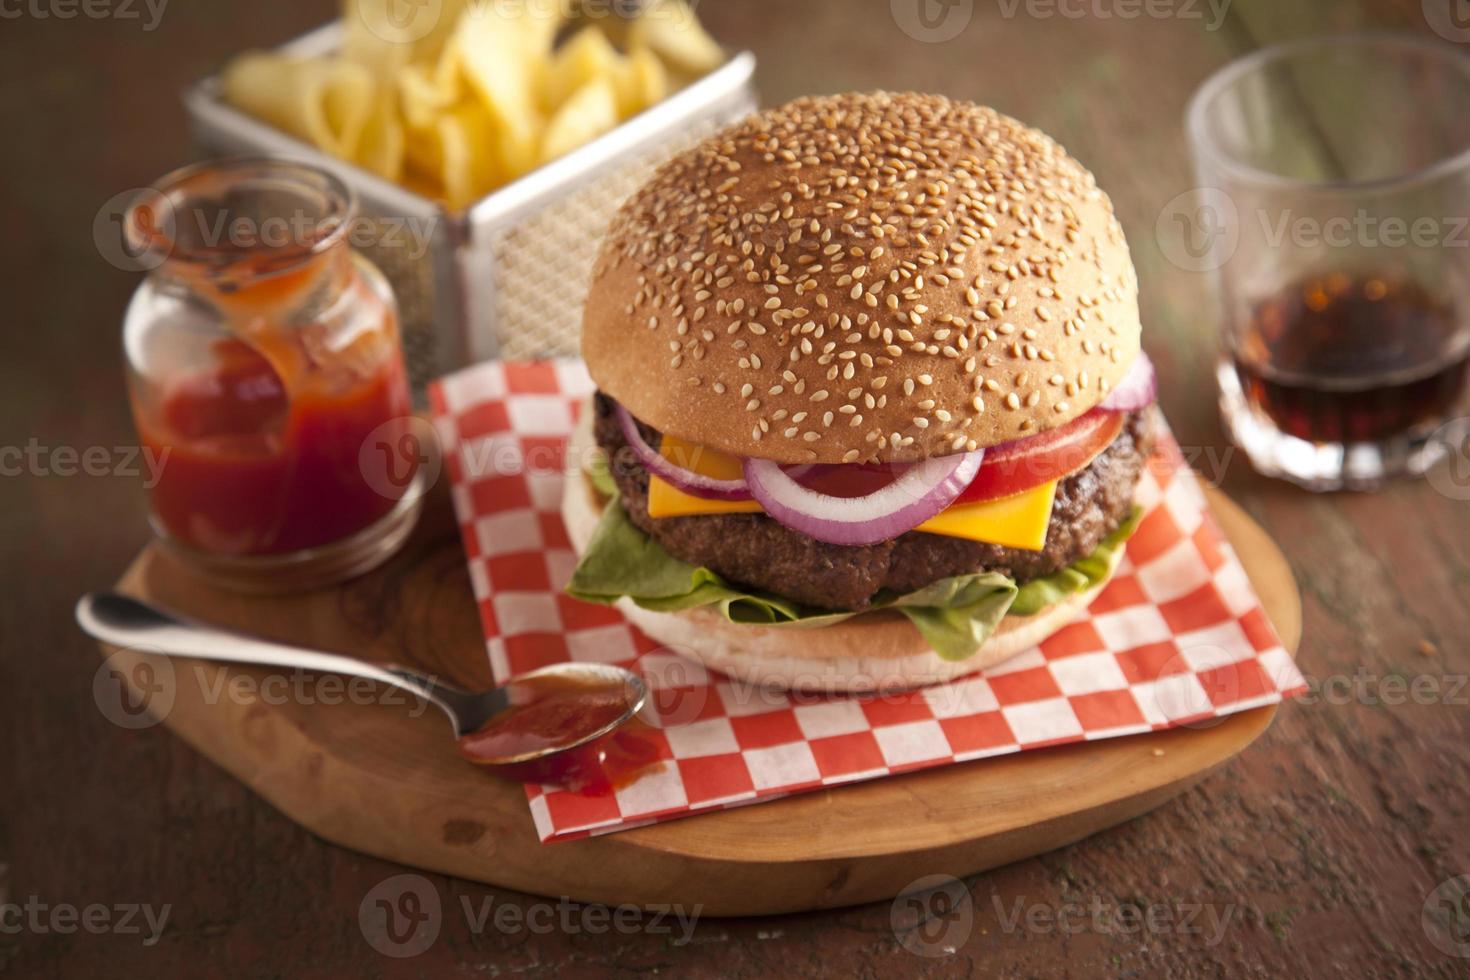 clássico cheeseburger cebola, tomate e picles pão de gergelim. foto